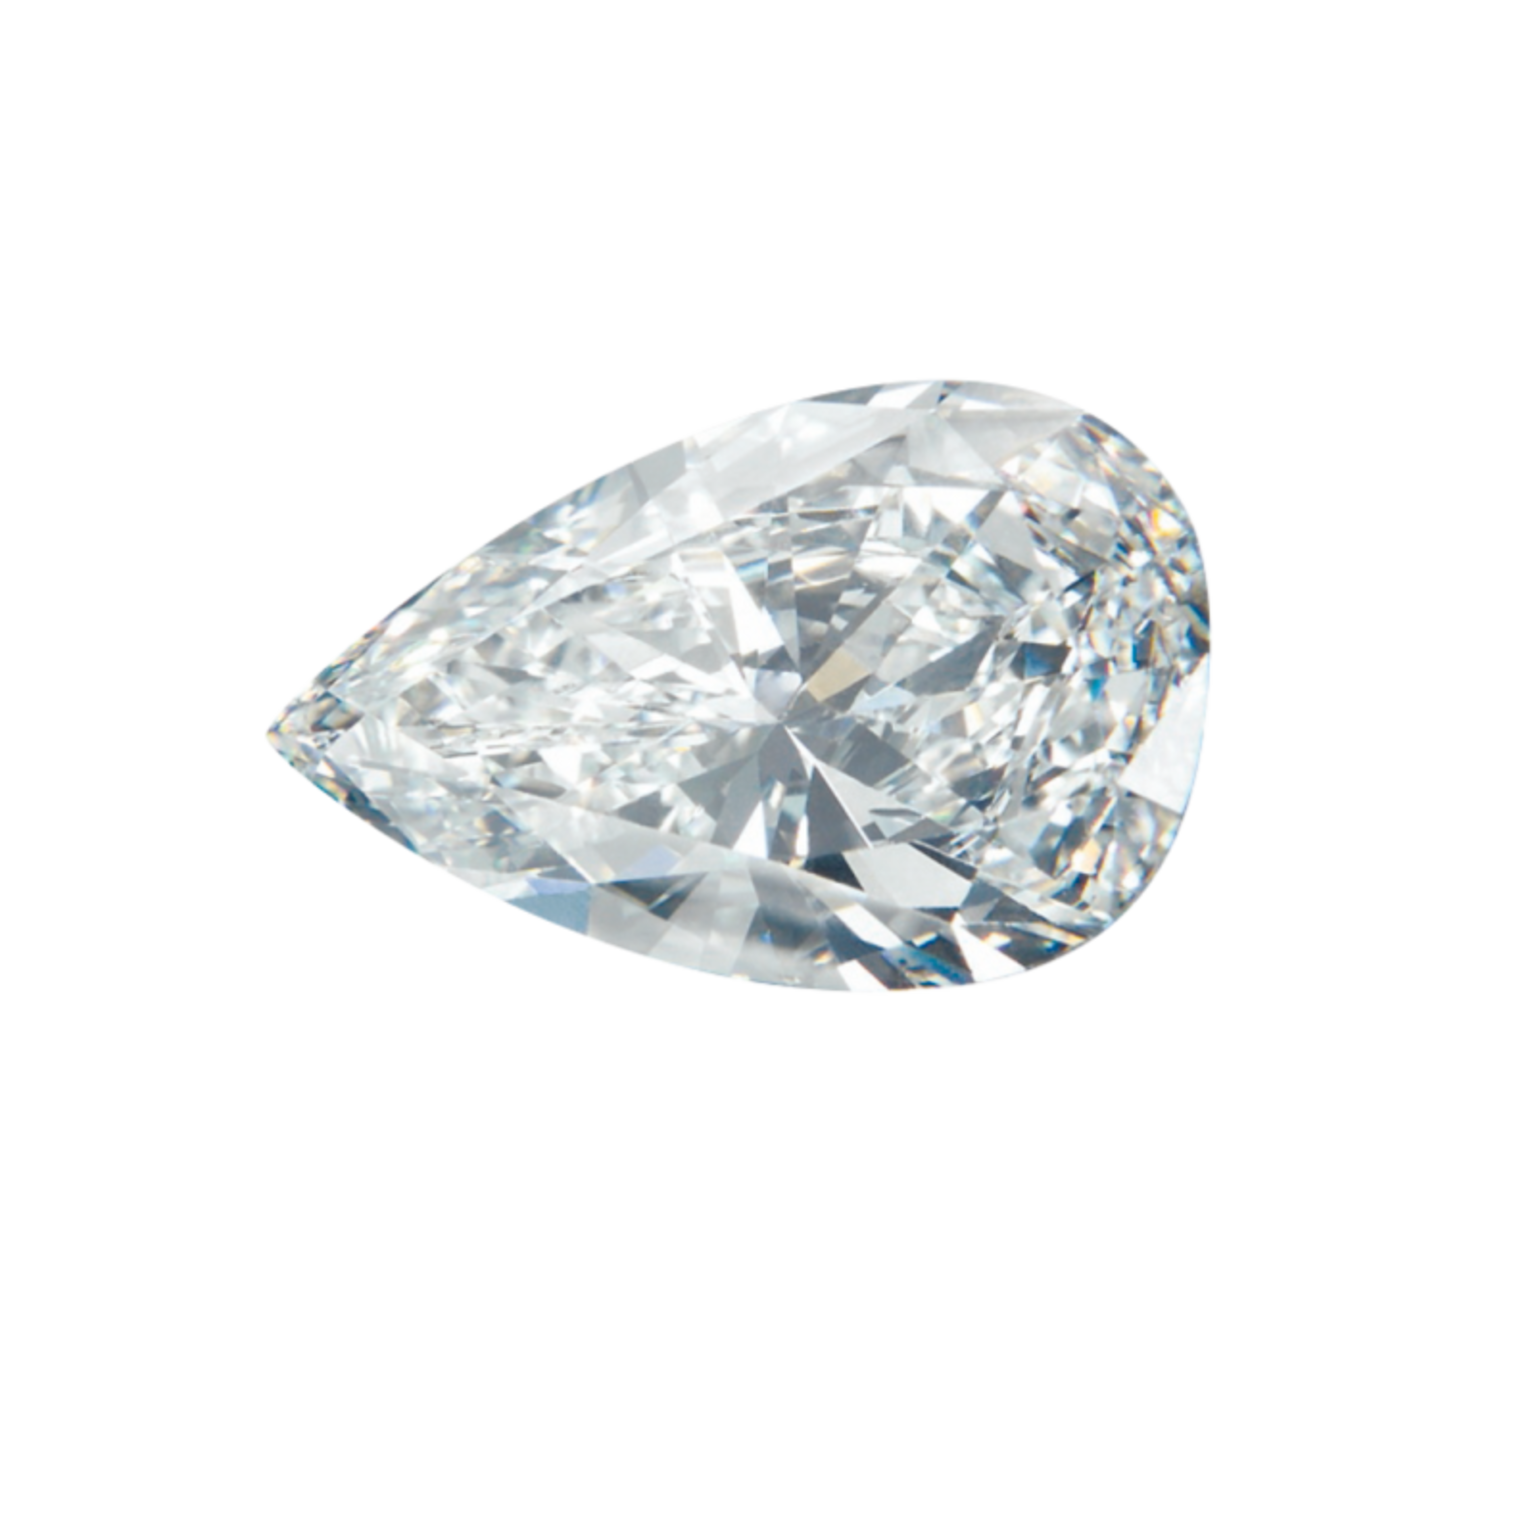 GASSAN Diamonds Pear Shape cut diamond